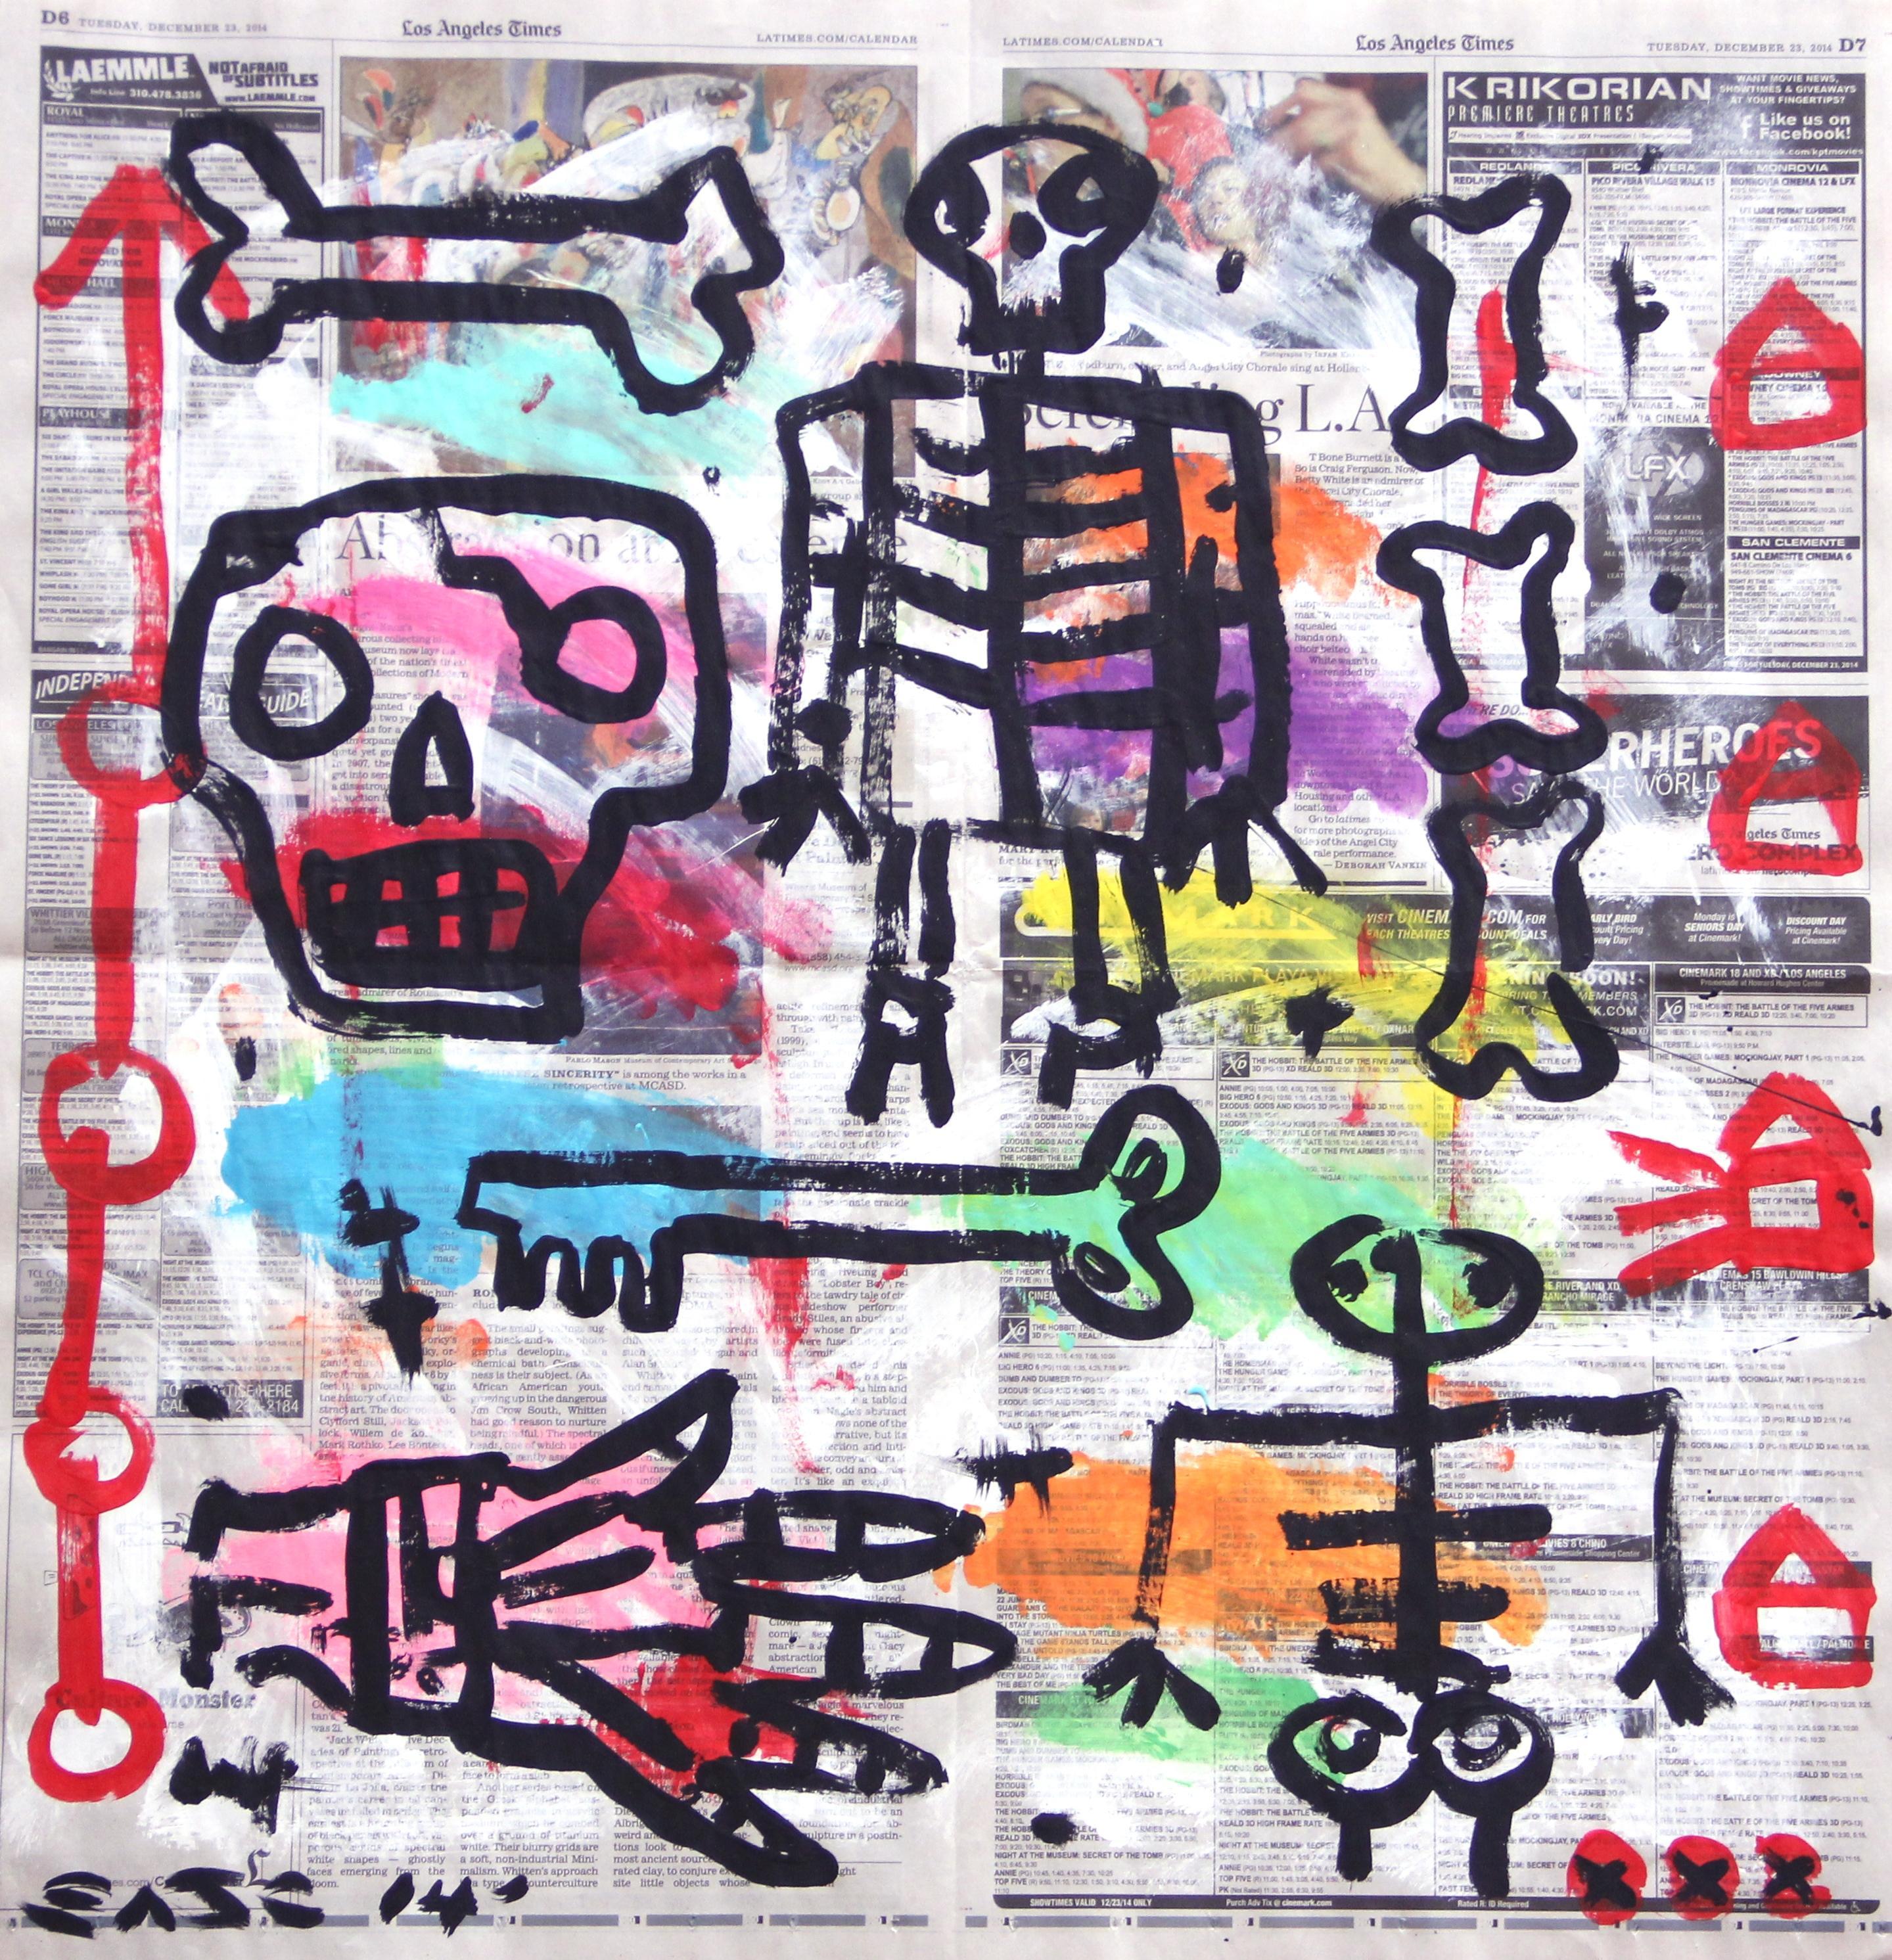 Krik - Original Gary John Street Art